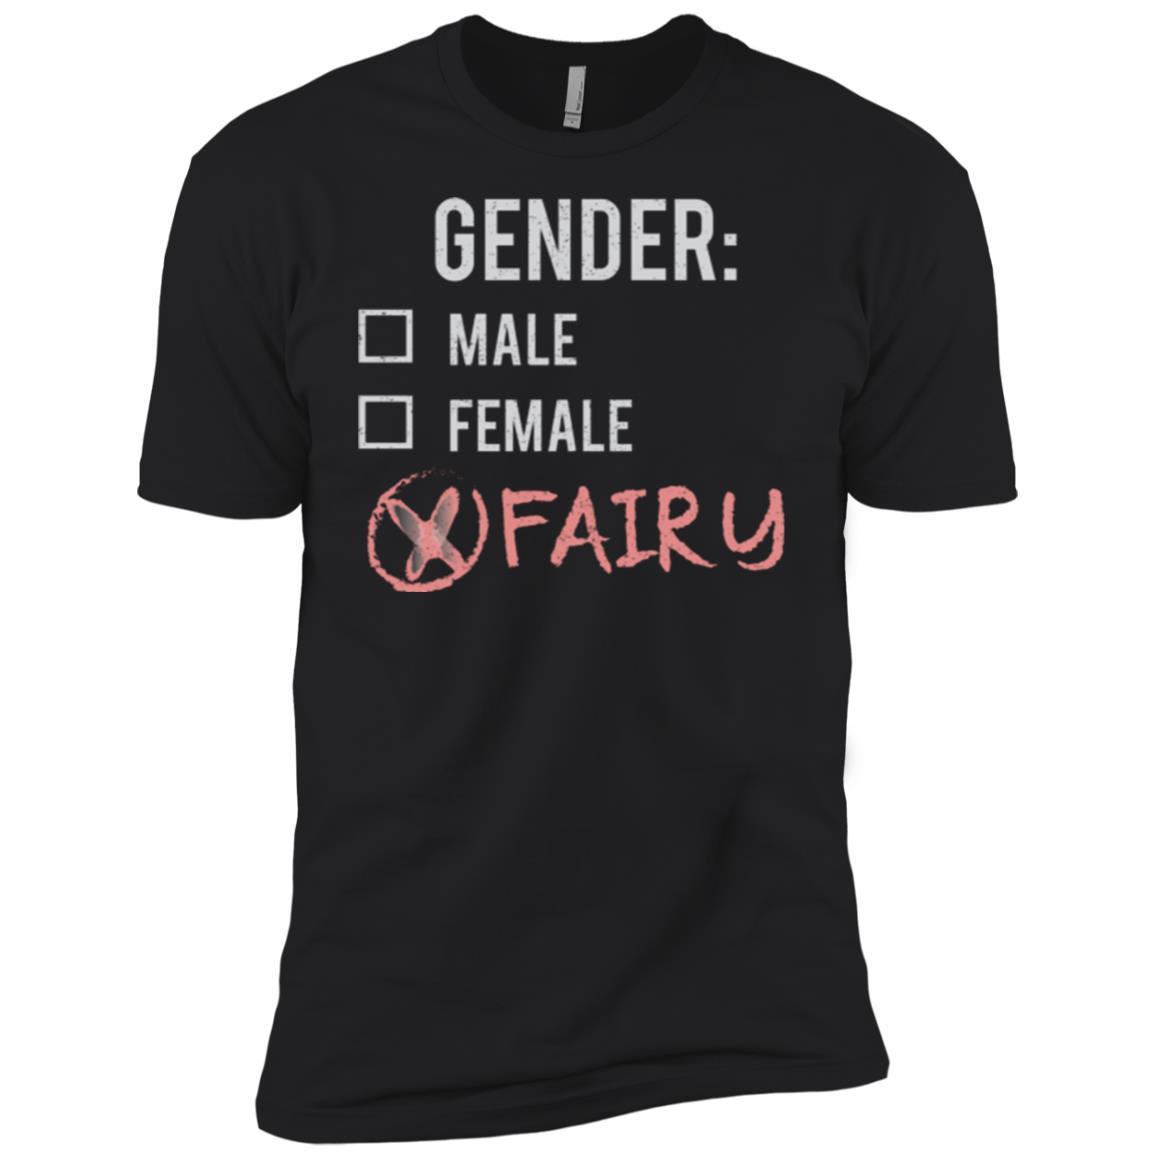 Male Female Fairy Gender Nonbinary Trans Men Short Sleeve T-Shirt